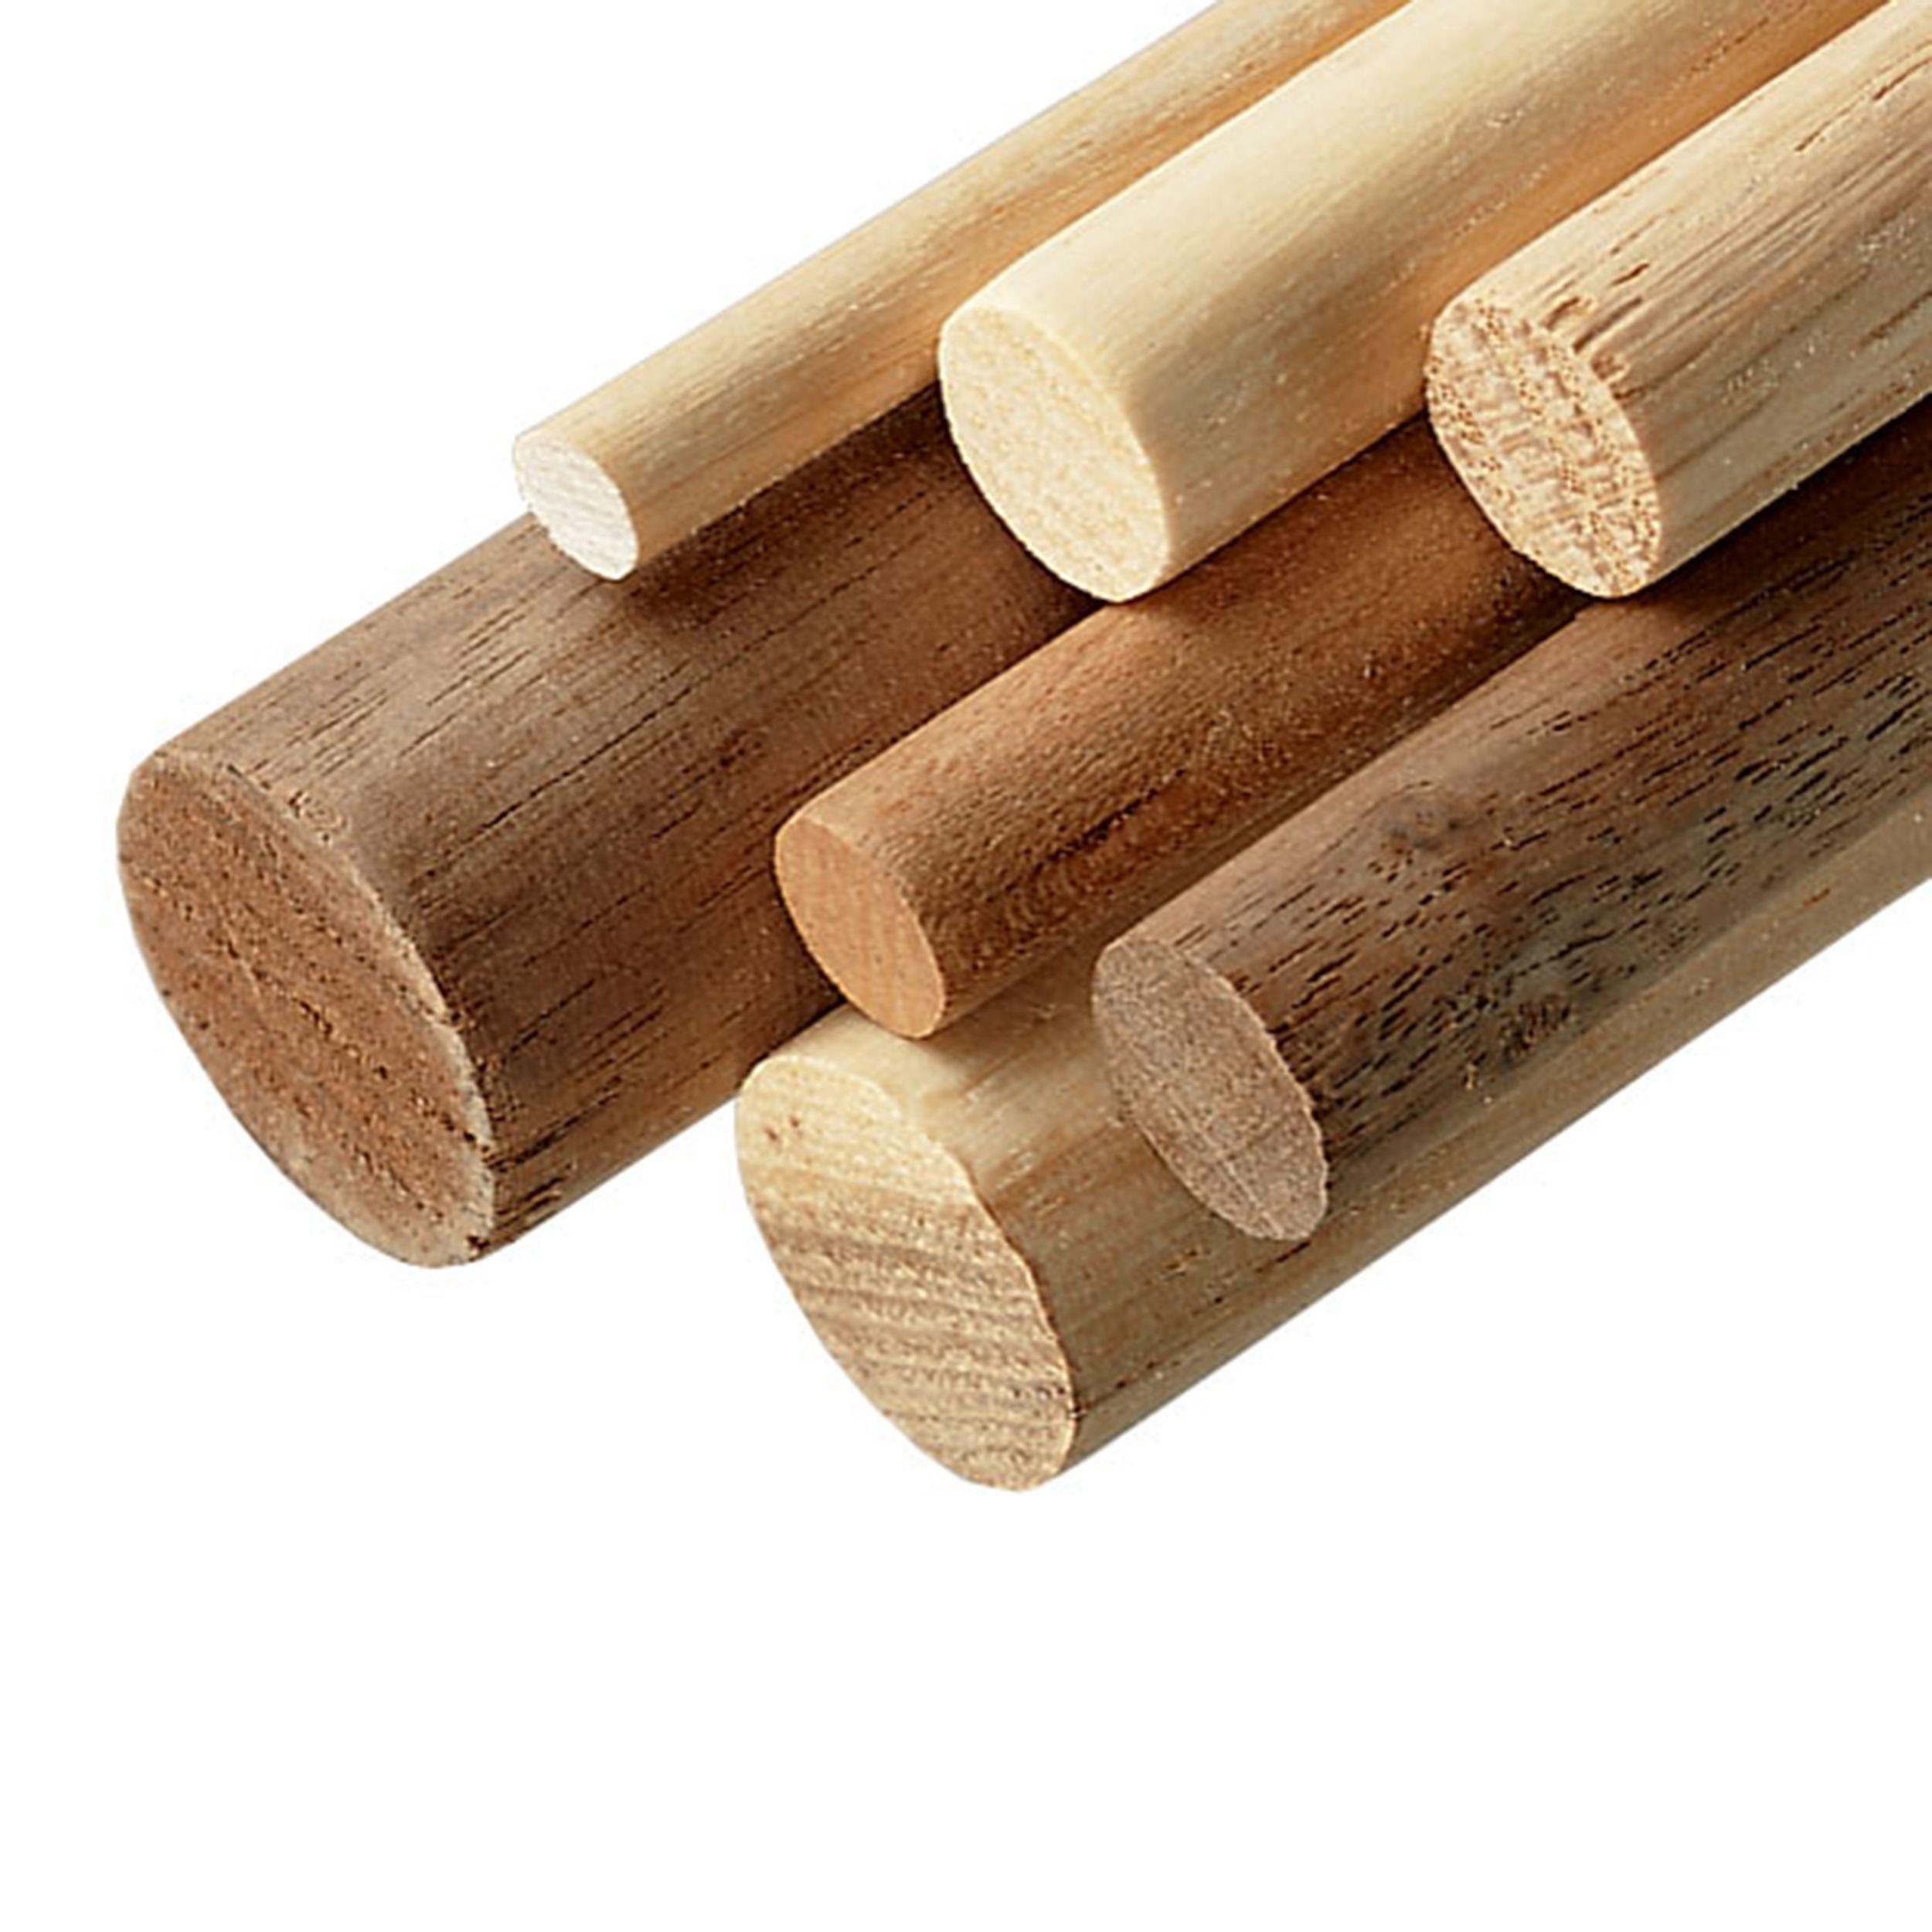 Eichendubel 1 1 8 Rund Cindoco Dowel Oak Woodworking Tools Woodworking Tools Diy Woodworking Tools In 2020 Woodworking Joints Woodworking Woodworking Joinery